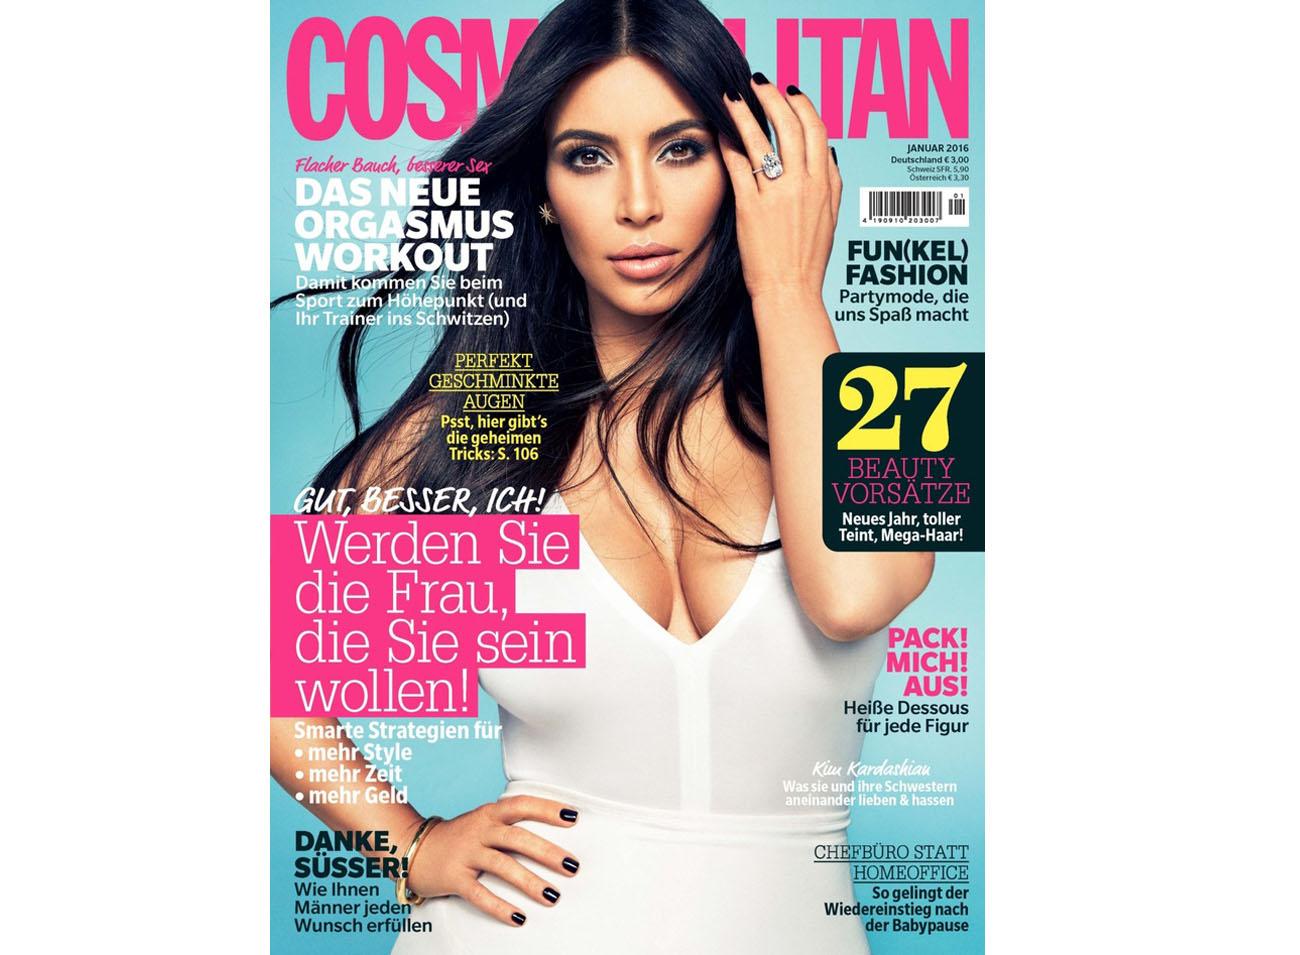 COSMOPOLITAN 10.12.2015 S.118 Cover